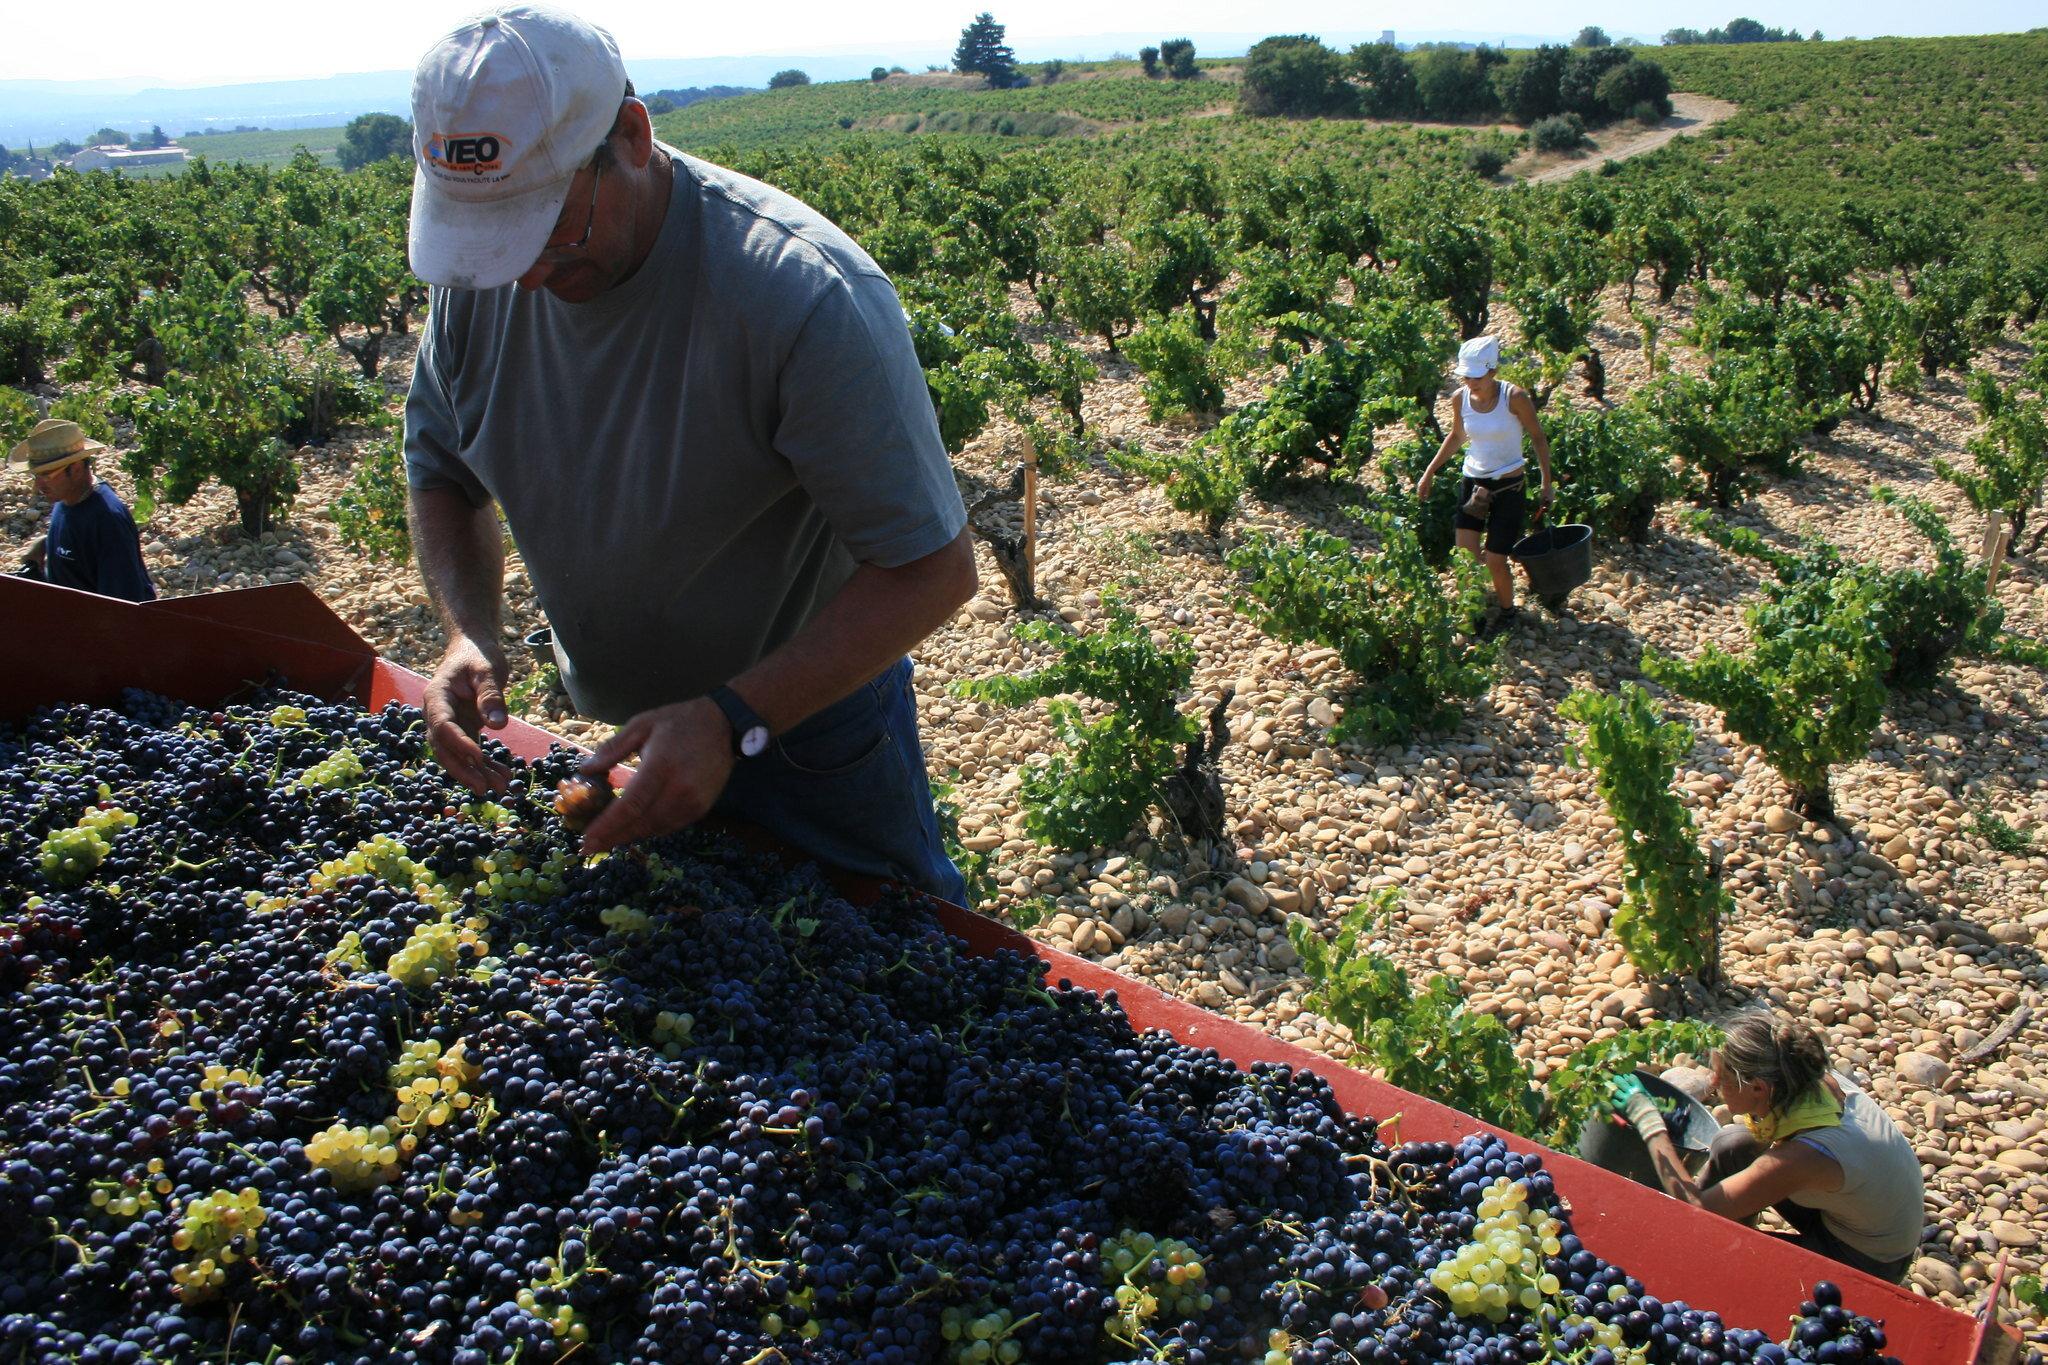 It's harvest season! Celebrating the month of the Vendanges